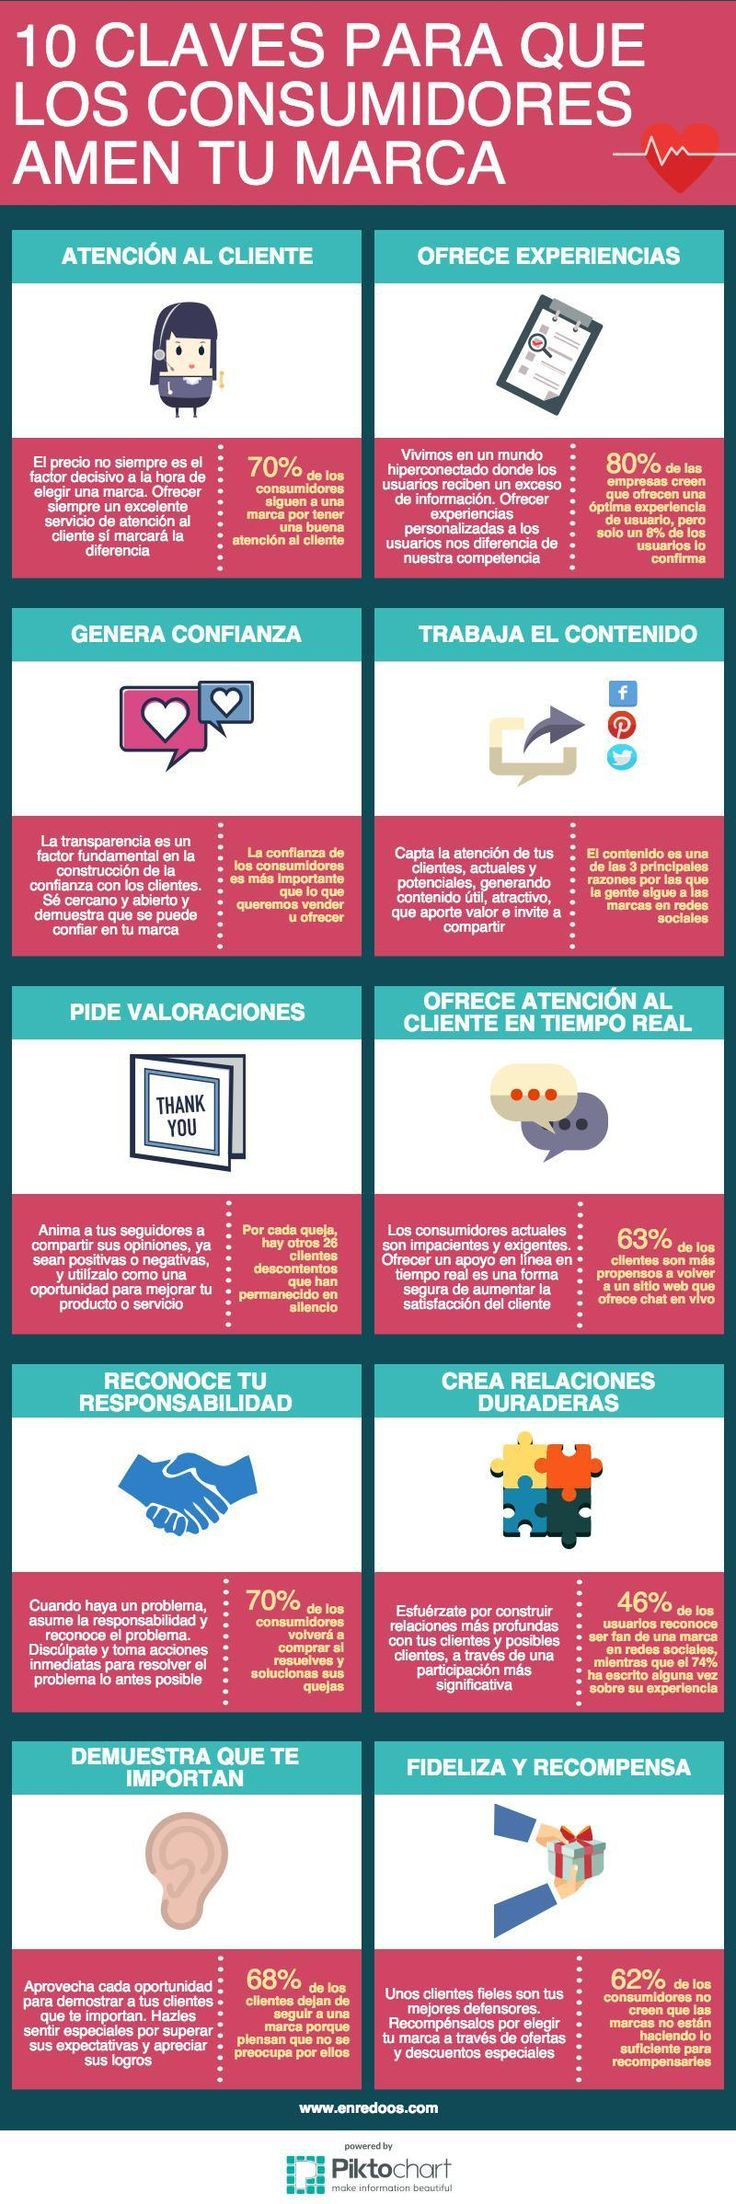 10 claves para que los consumidores amen tu Marca #infografia #infographic #marketing